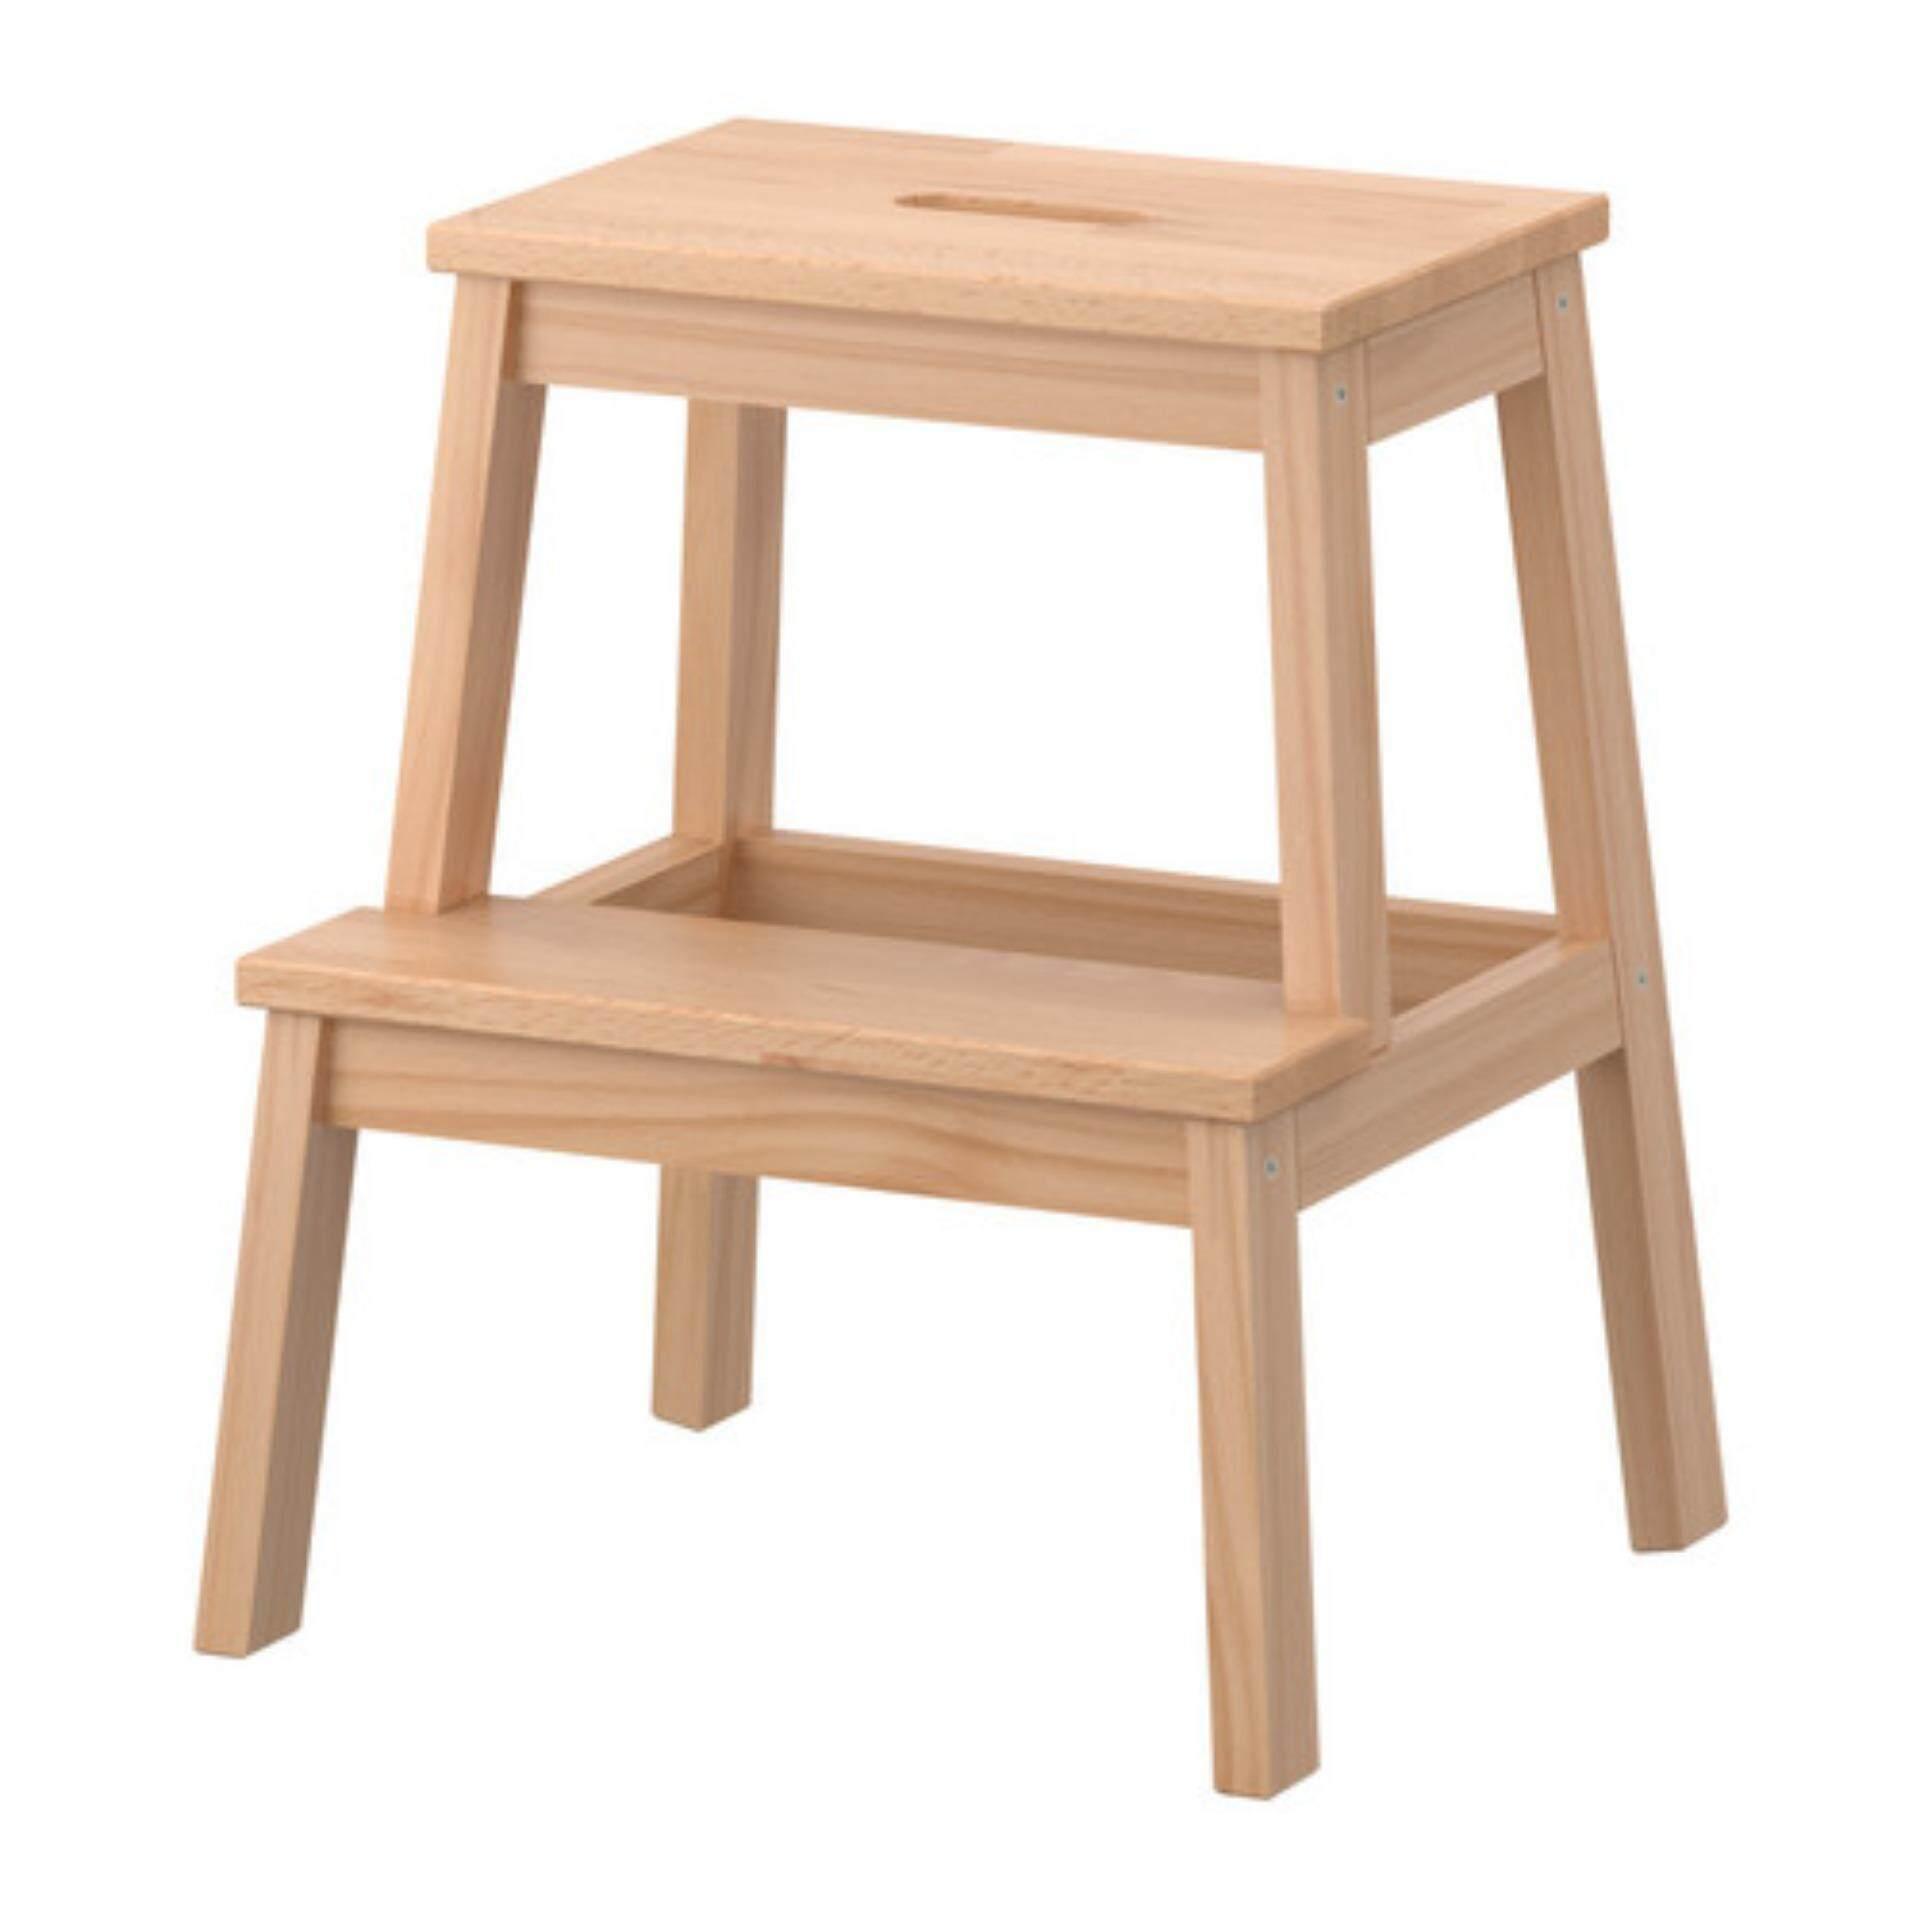 BEKVAM Multipurpose Step Stool Natural Solid Wood, Home Office, Kids,  School, Side